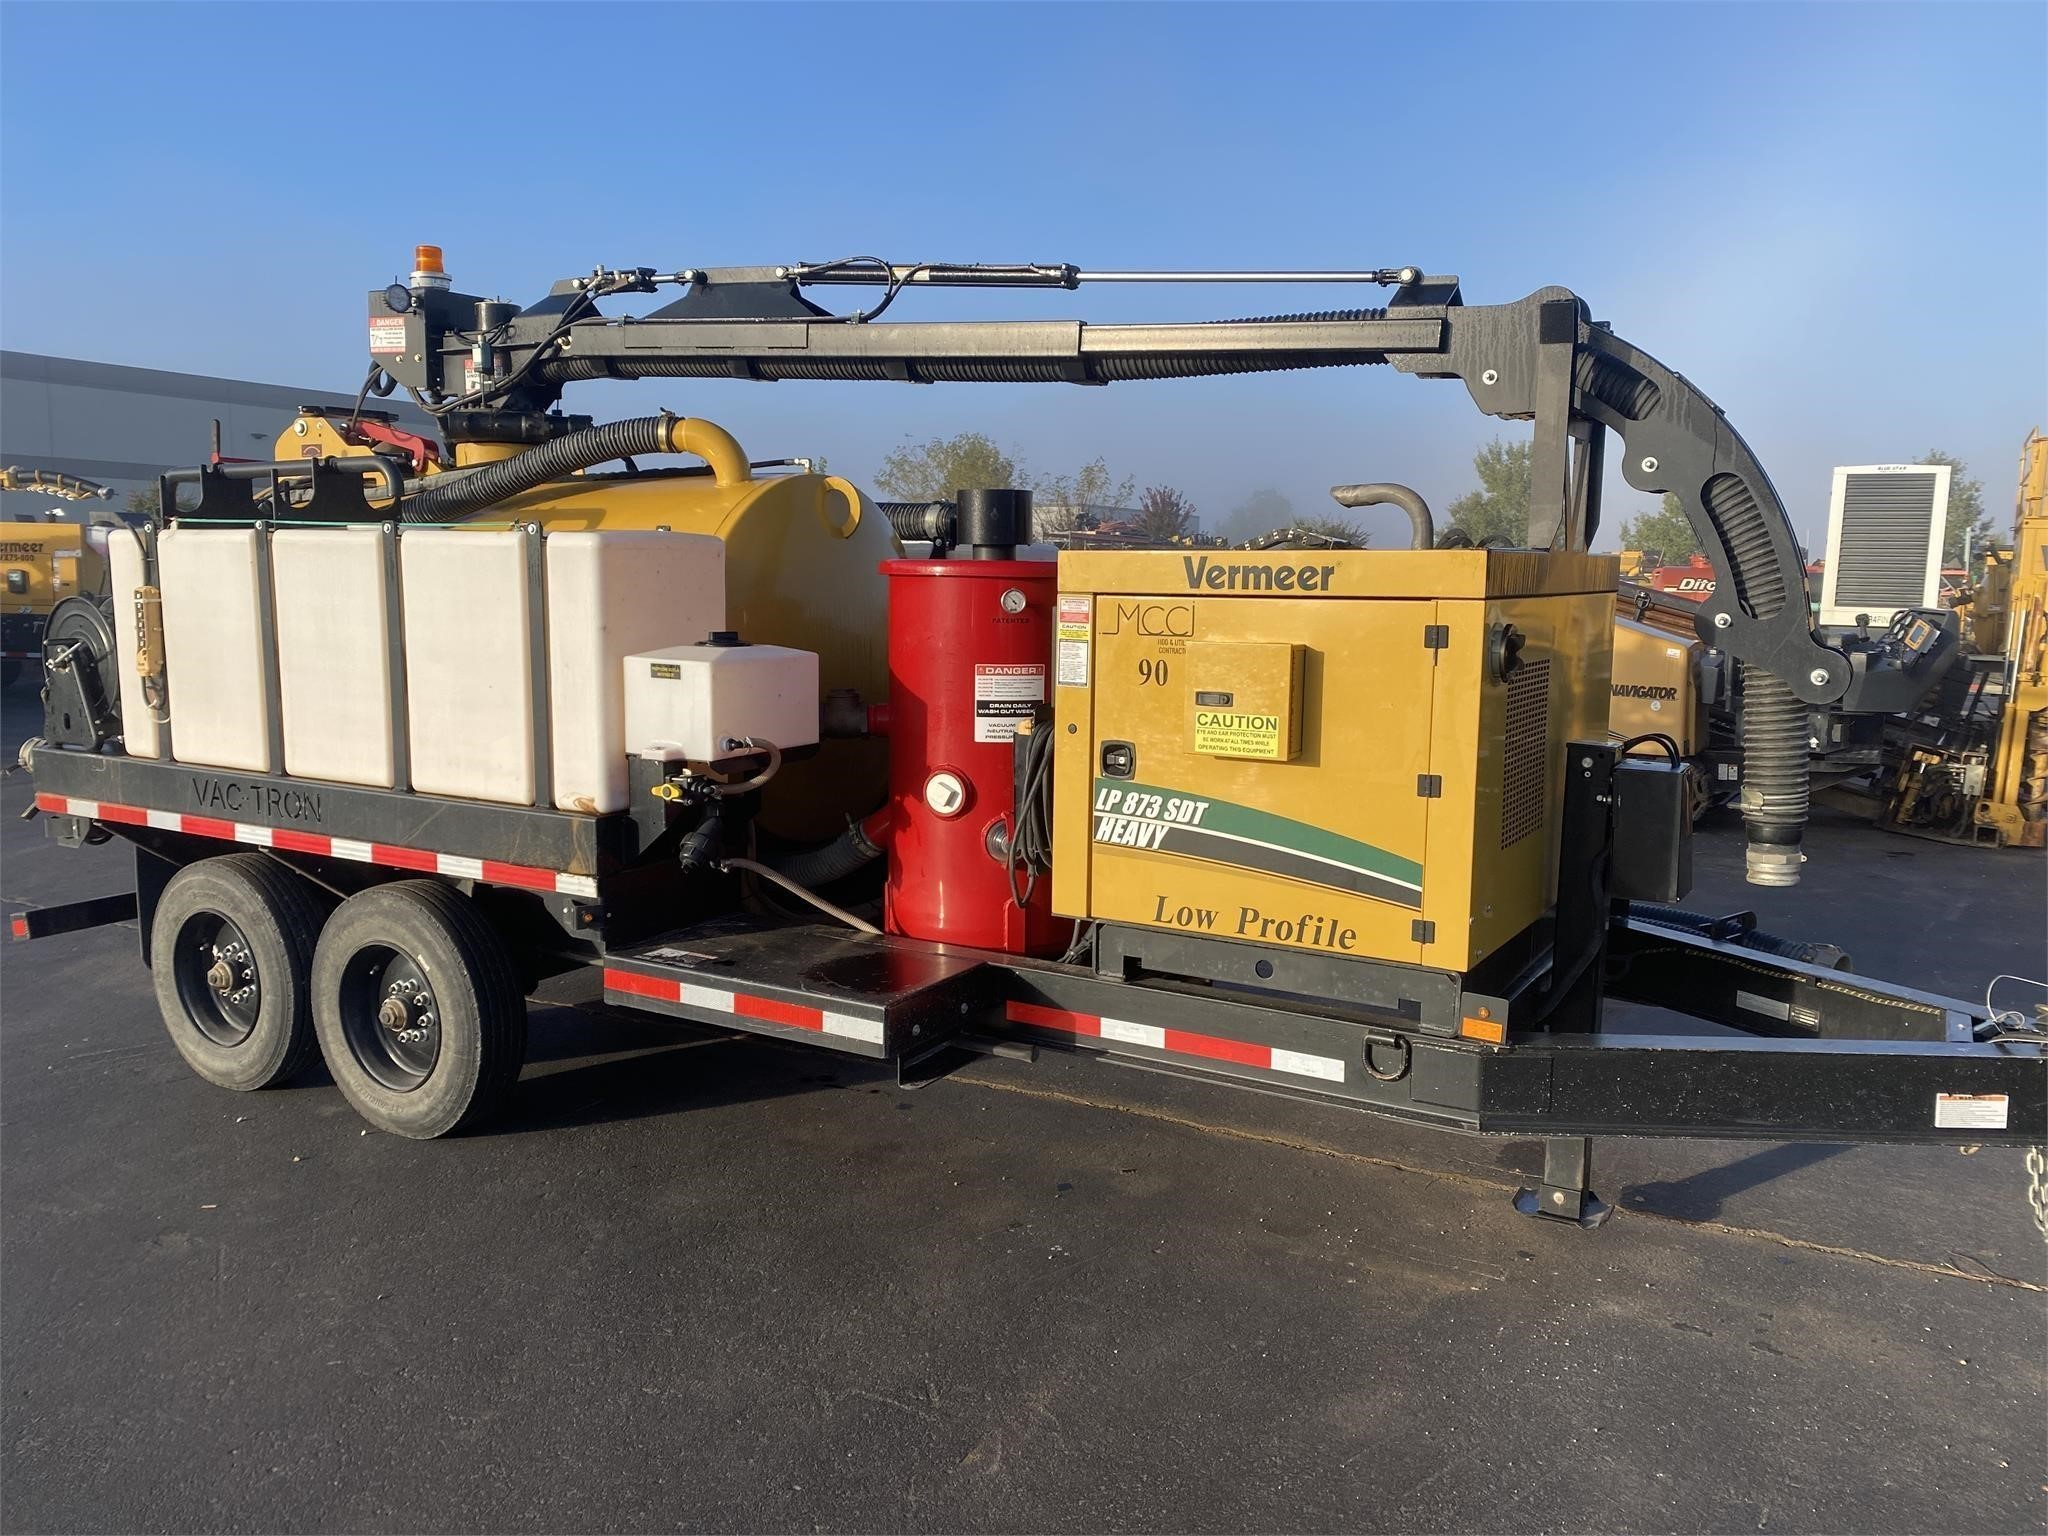 Used, 2018, VAC TRON, LP873SDTH, Vacuum Excavators